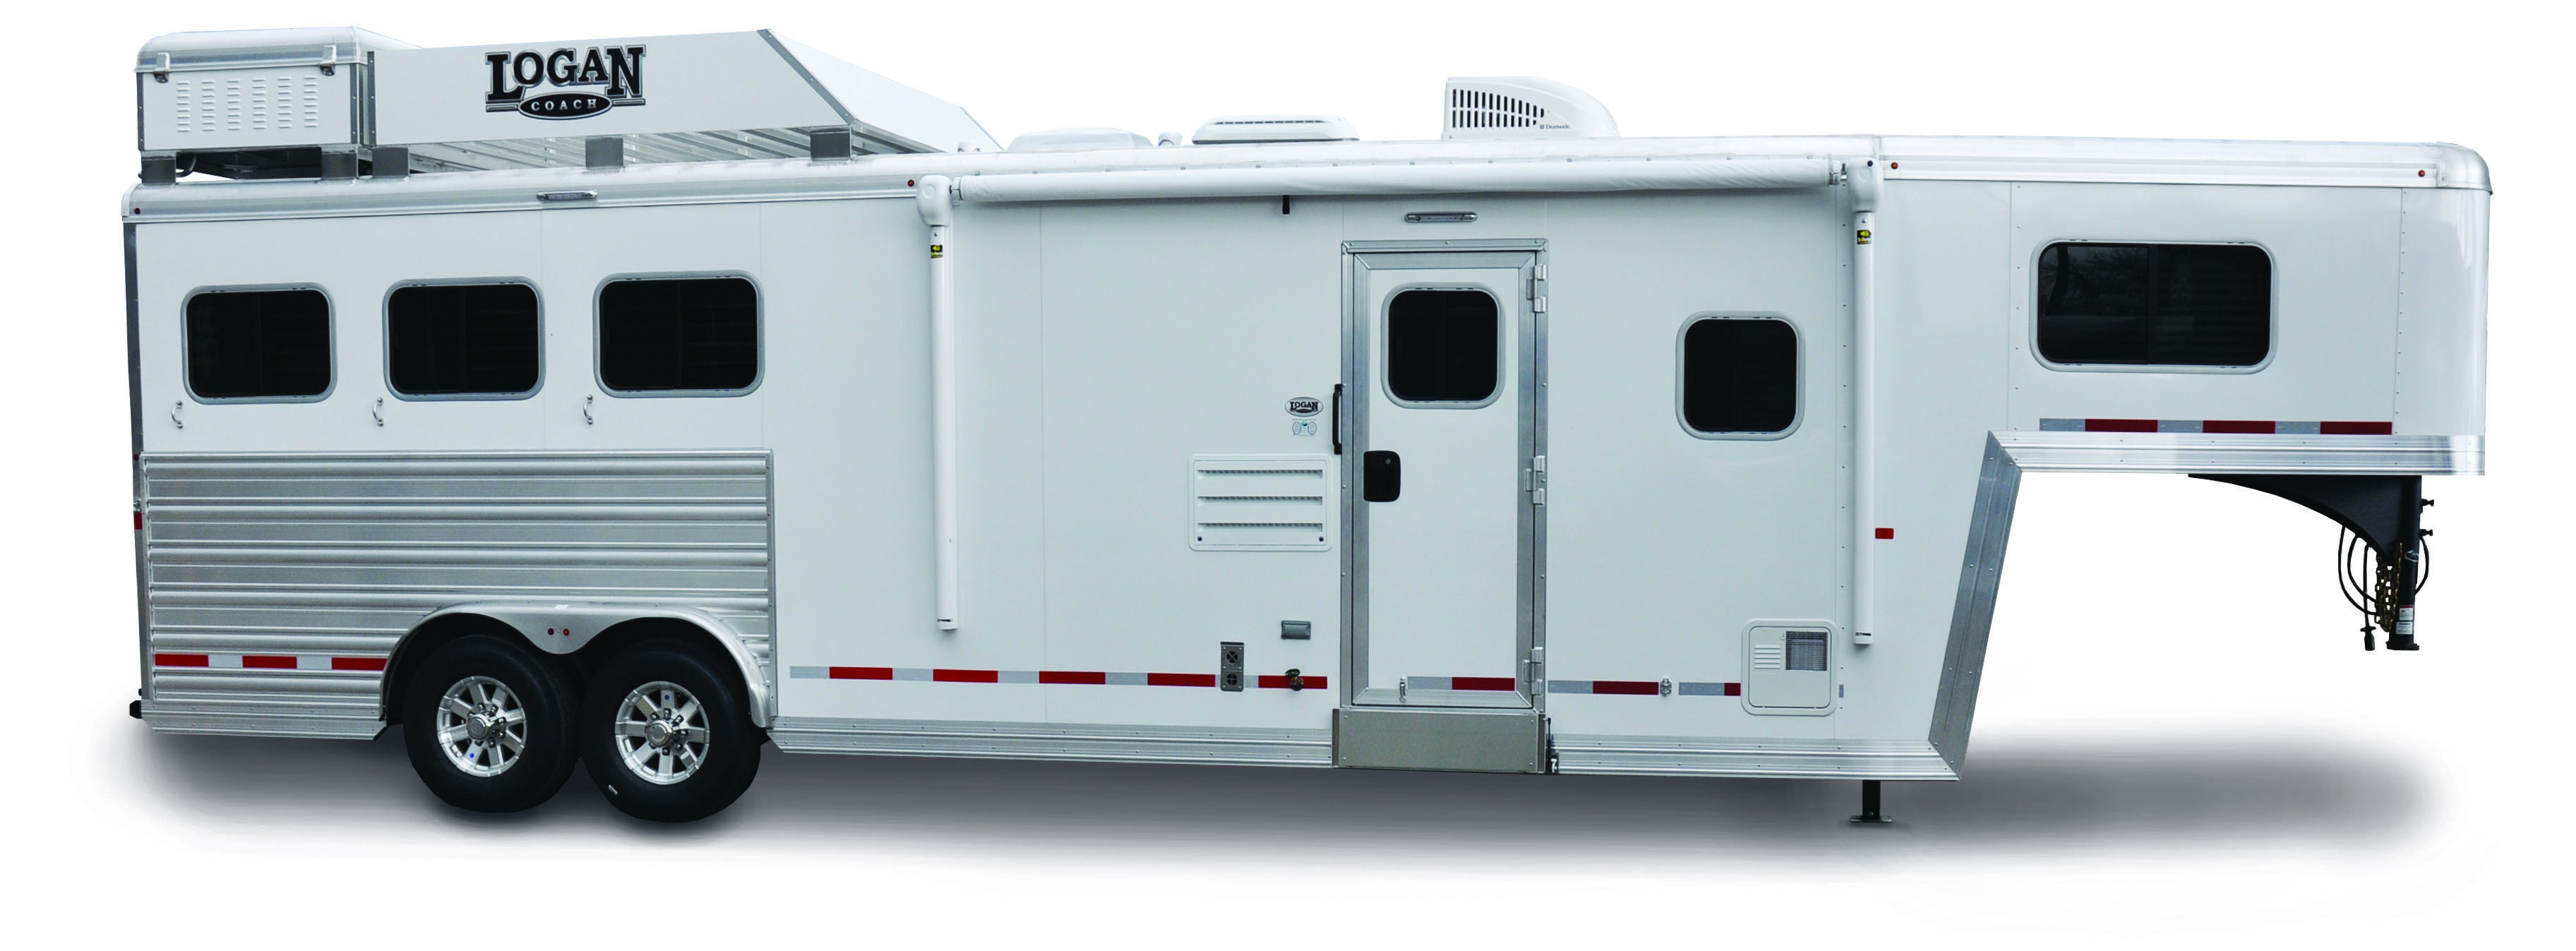 Logan Coach 812 Limited 4H w/ Full-Rear Tack